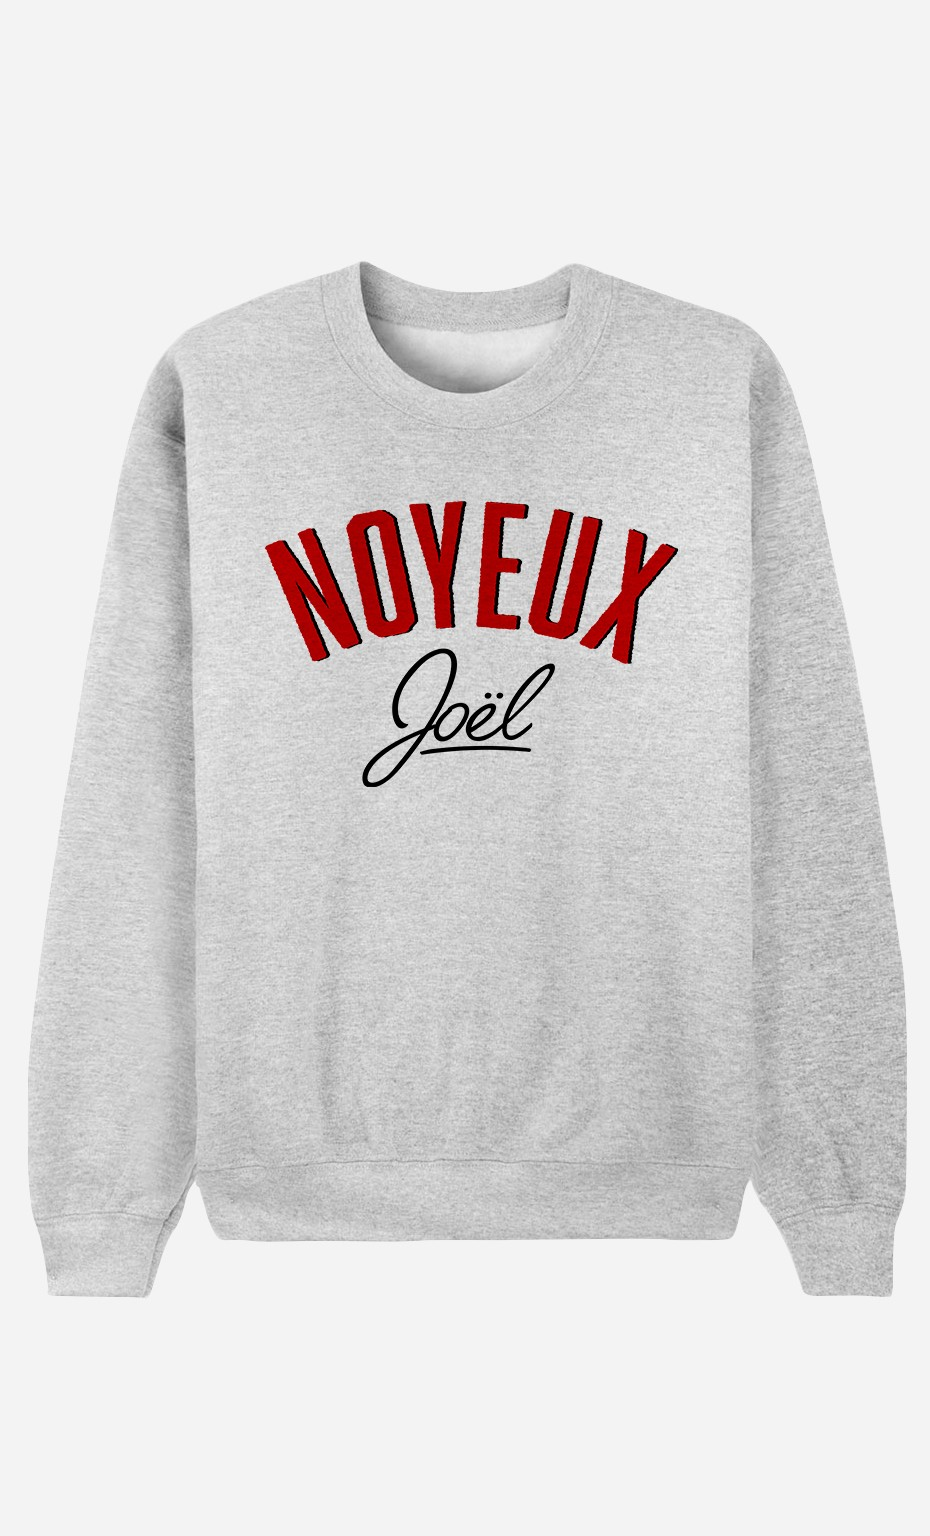 Sweat Noyeux Joël